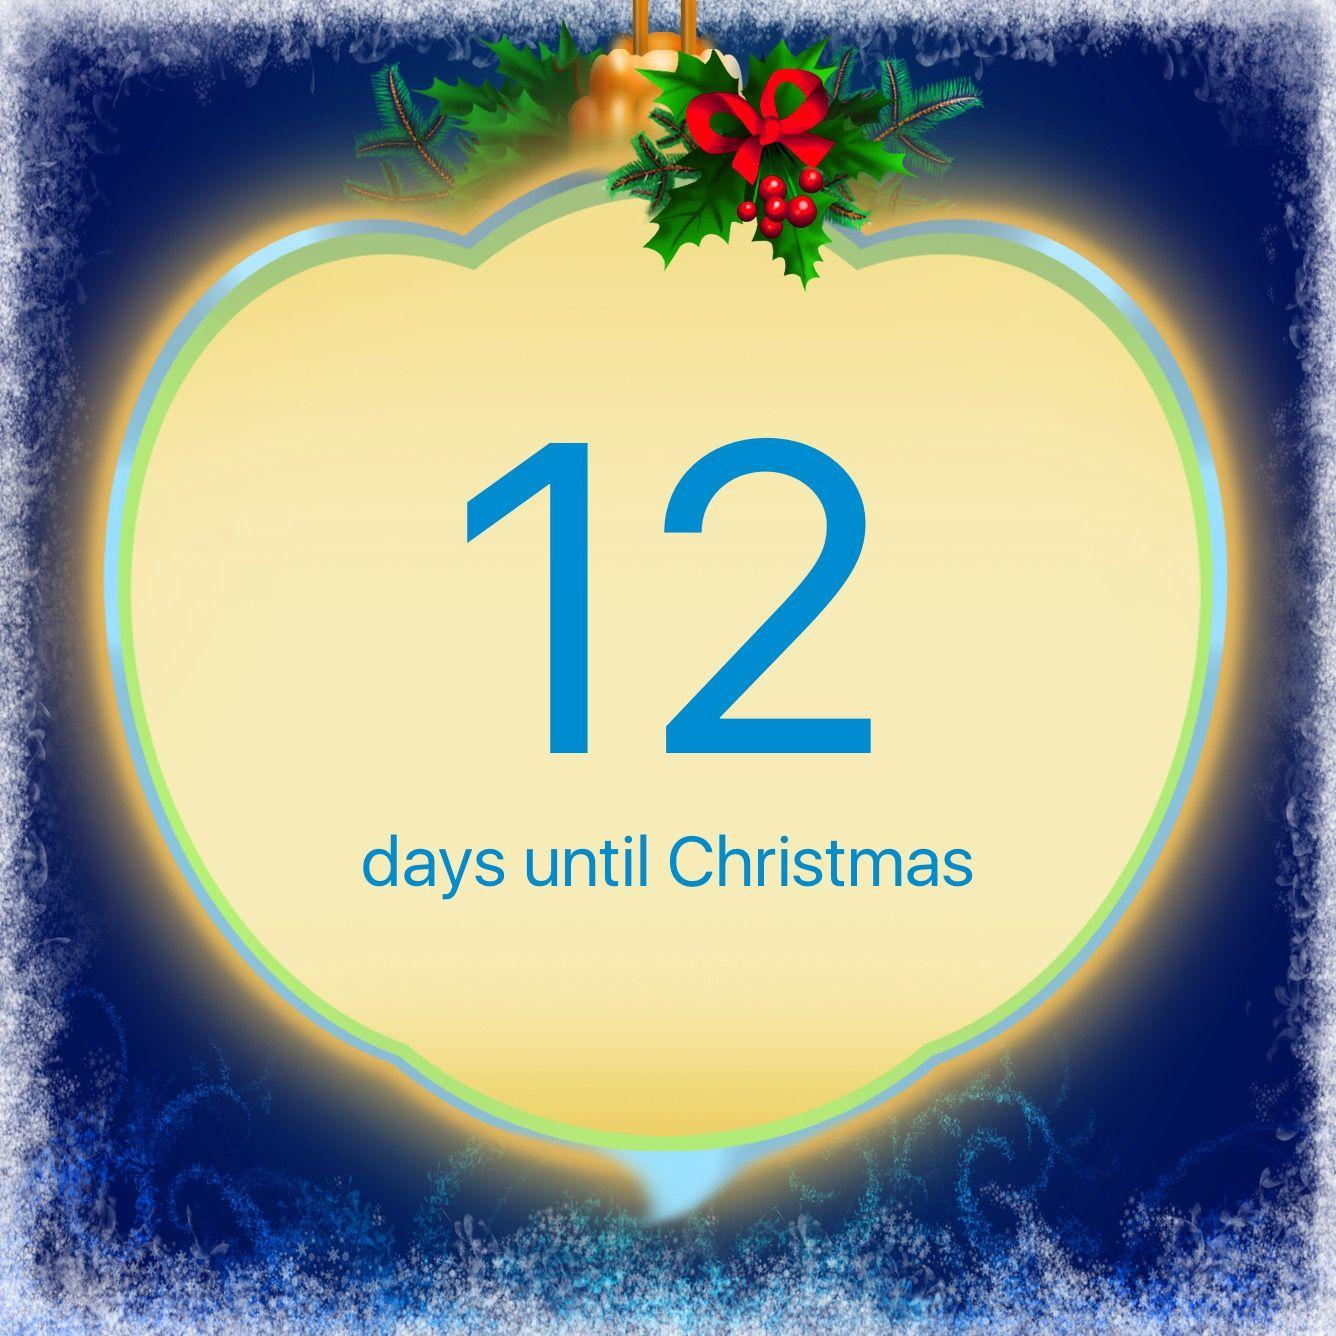 I'm counting days to Christmas using this Christmas